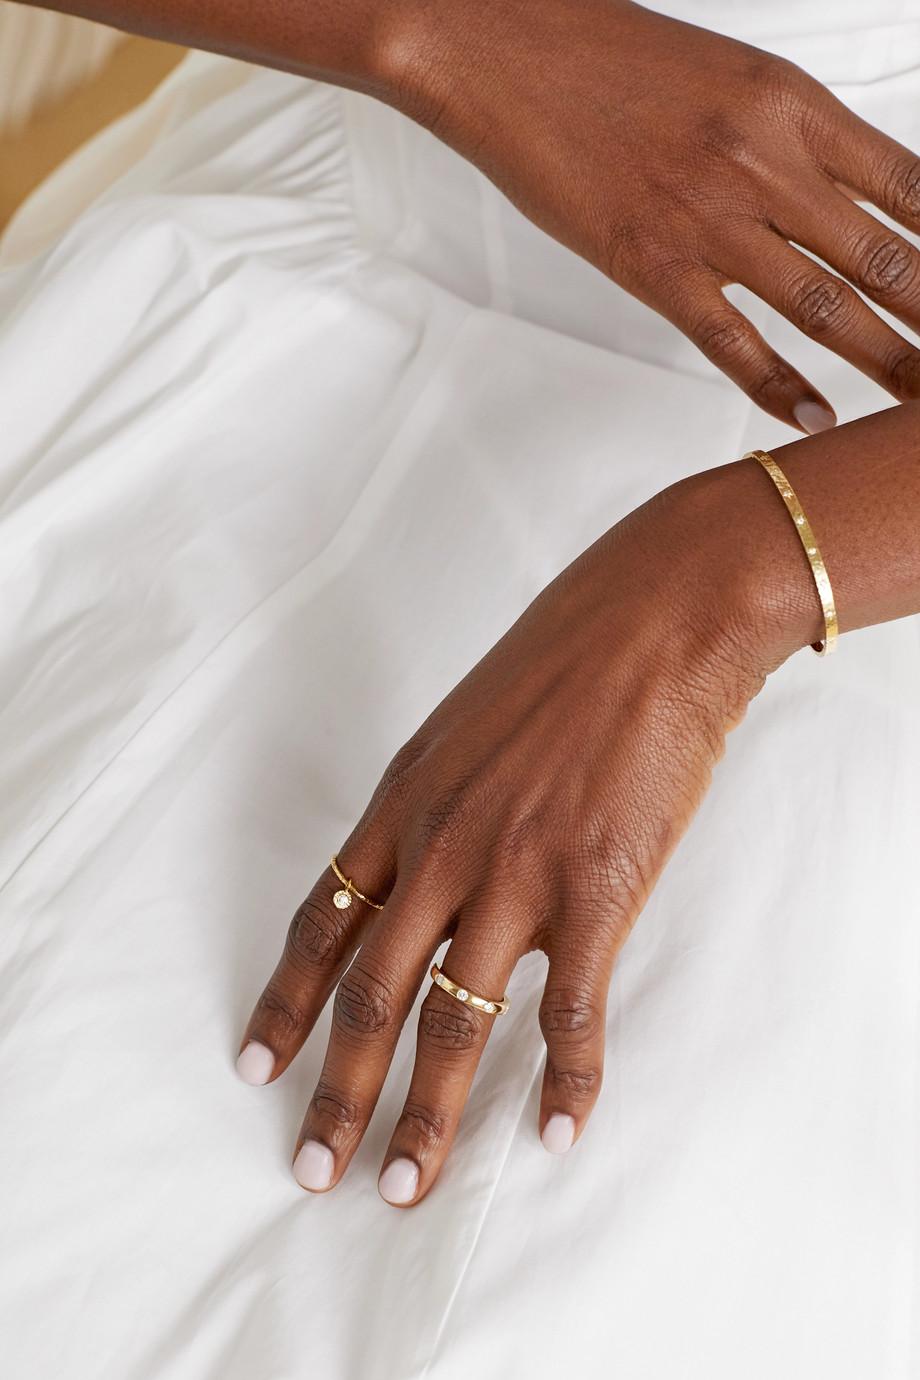 Octavia Elizabeth + NET SUSTAIN Nesting Gem Ring aus 18 Karat Gold mit Diamant